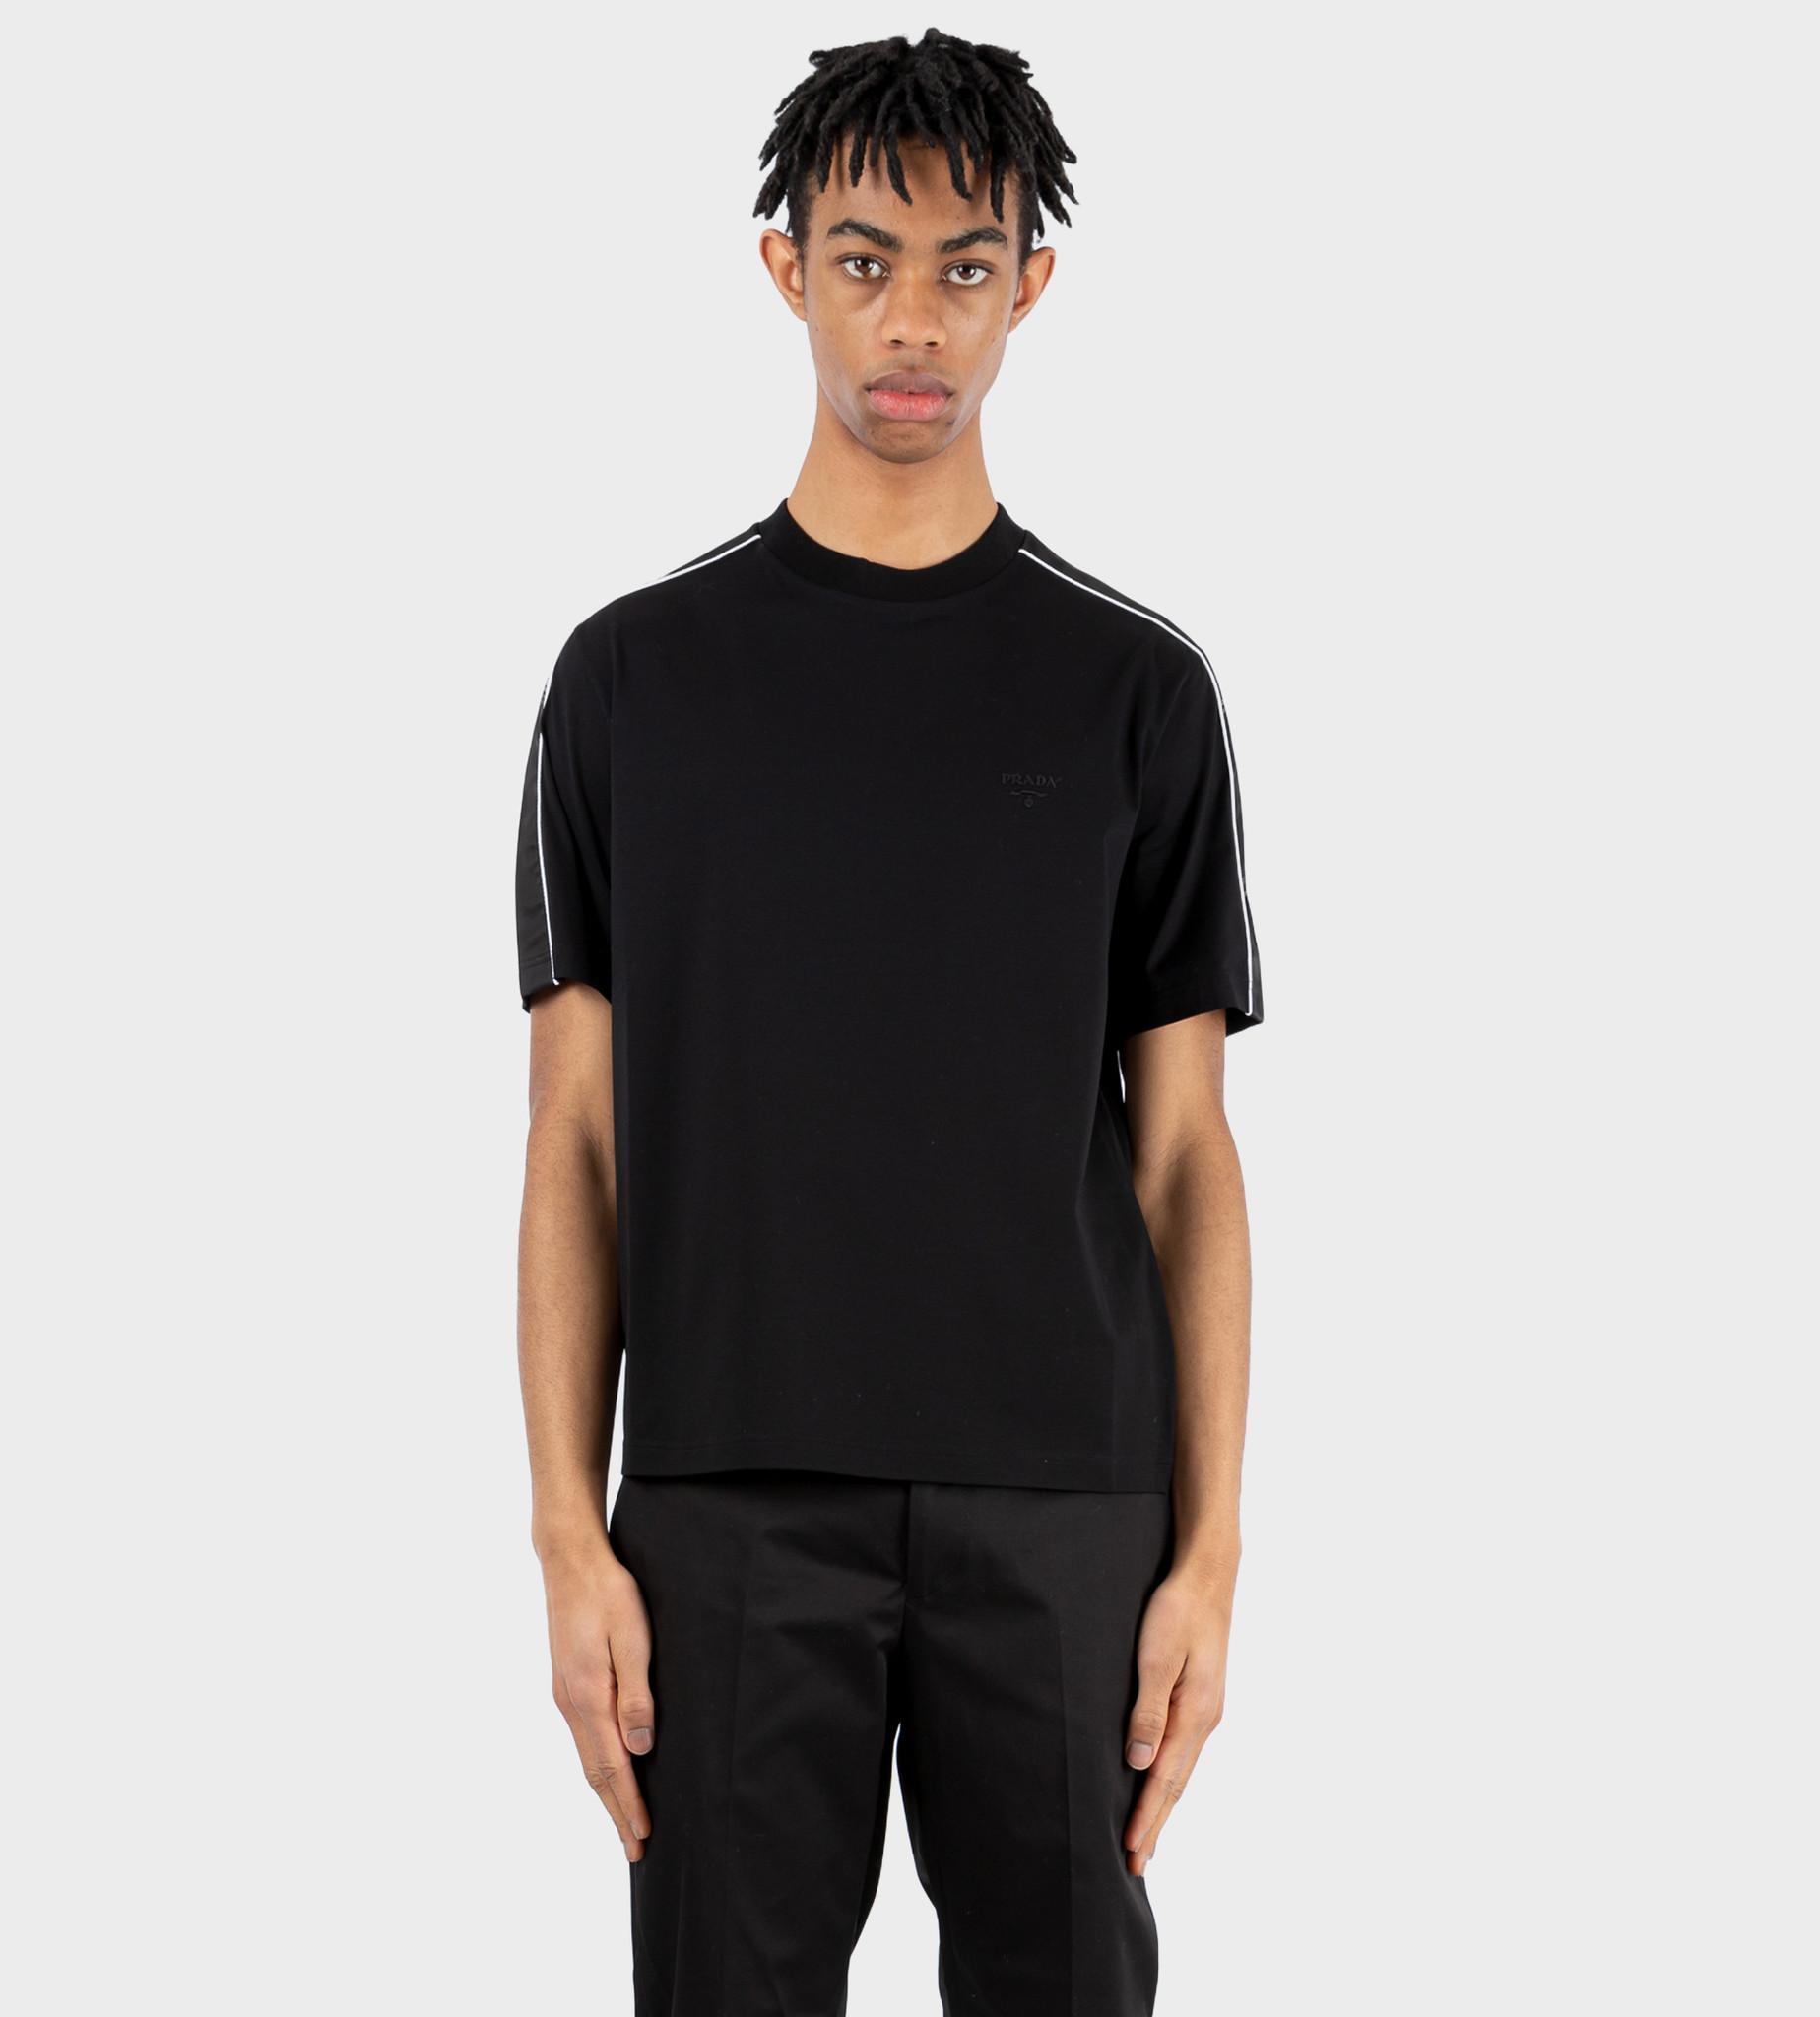 PRADA Stretch Cotton T-shirt With Nylon Details Black